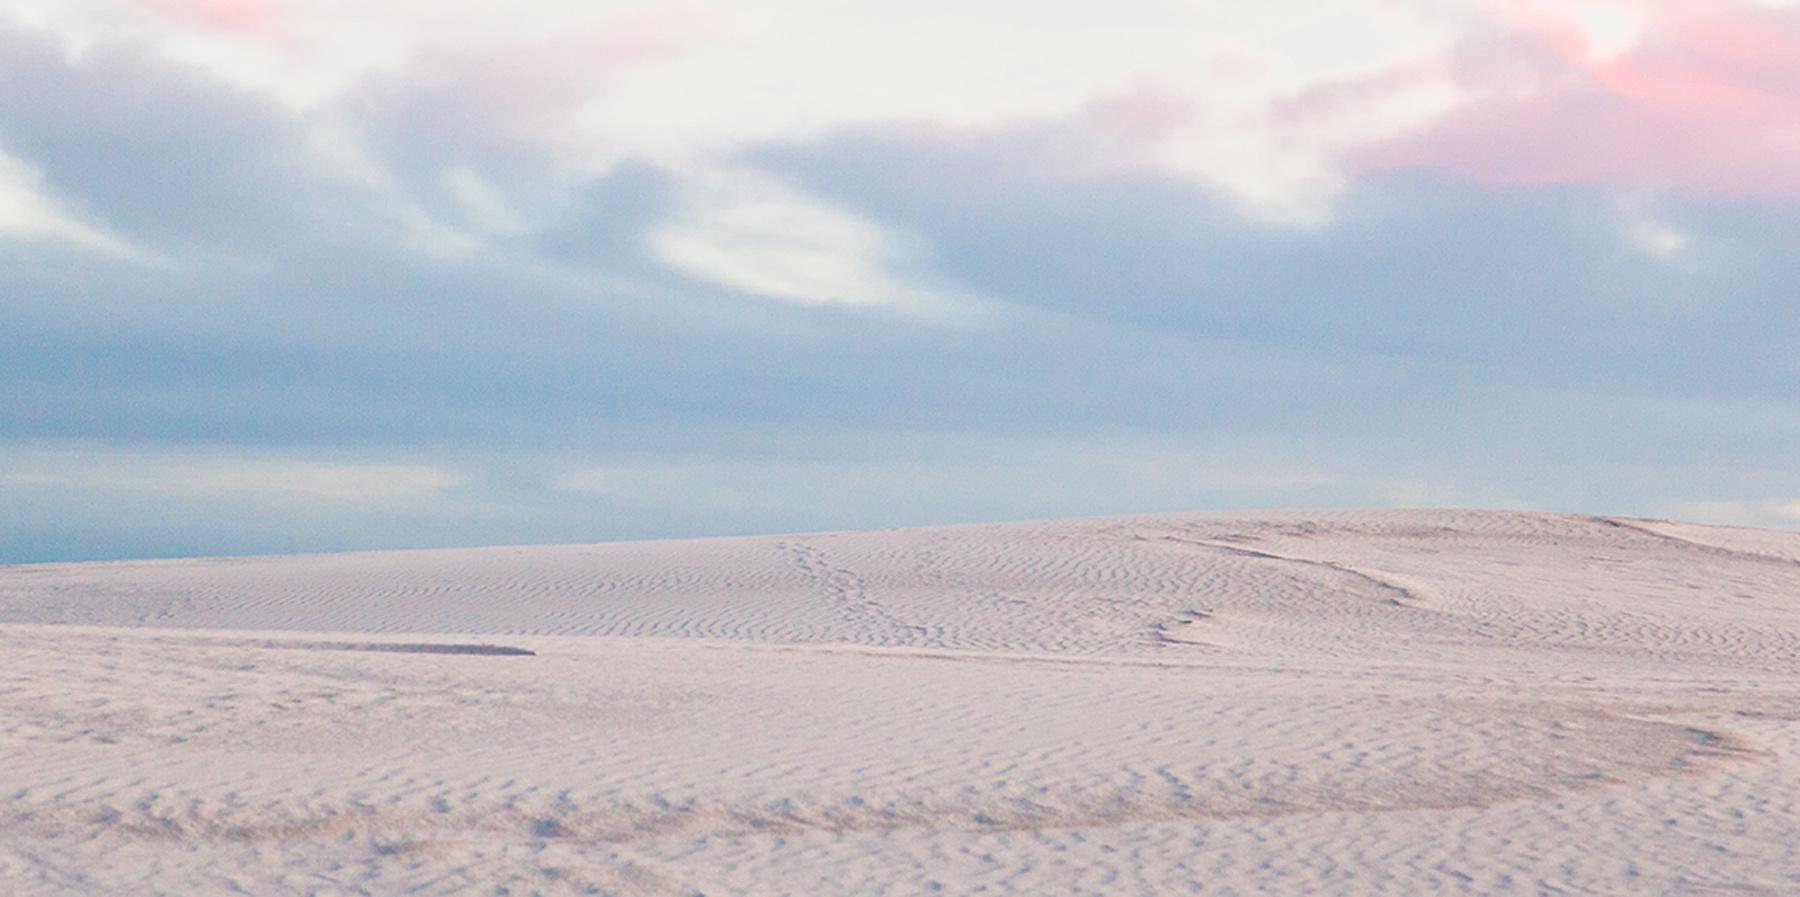 Dunescape I, White Sands National Monument